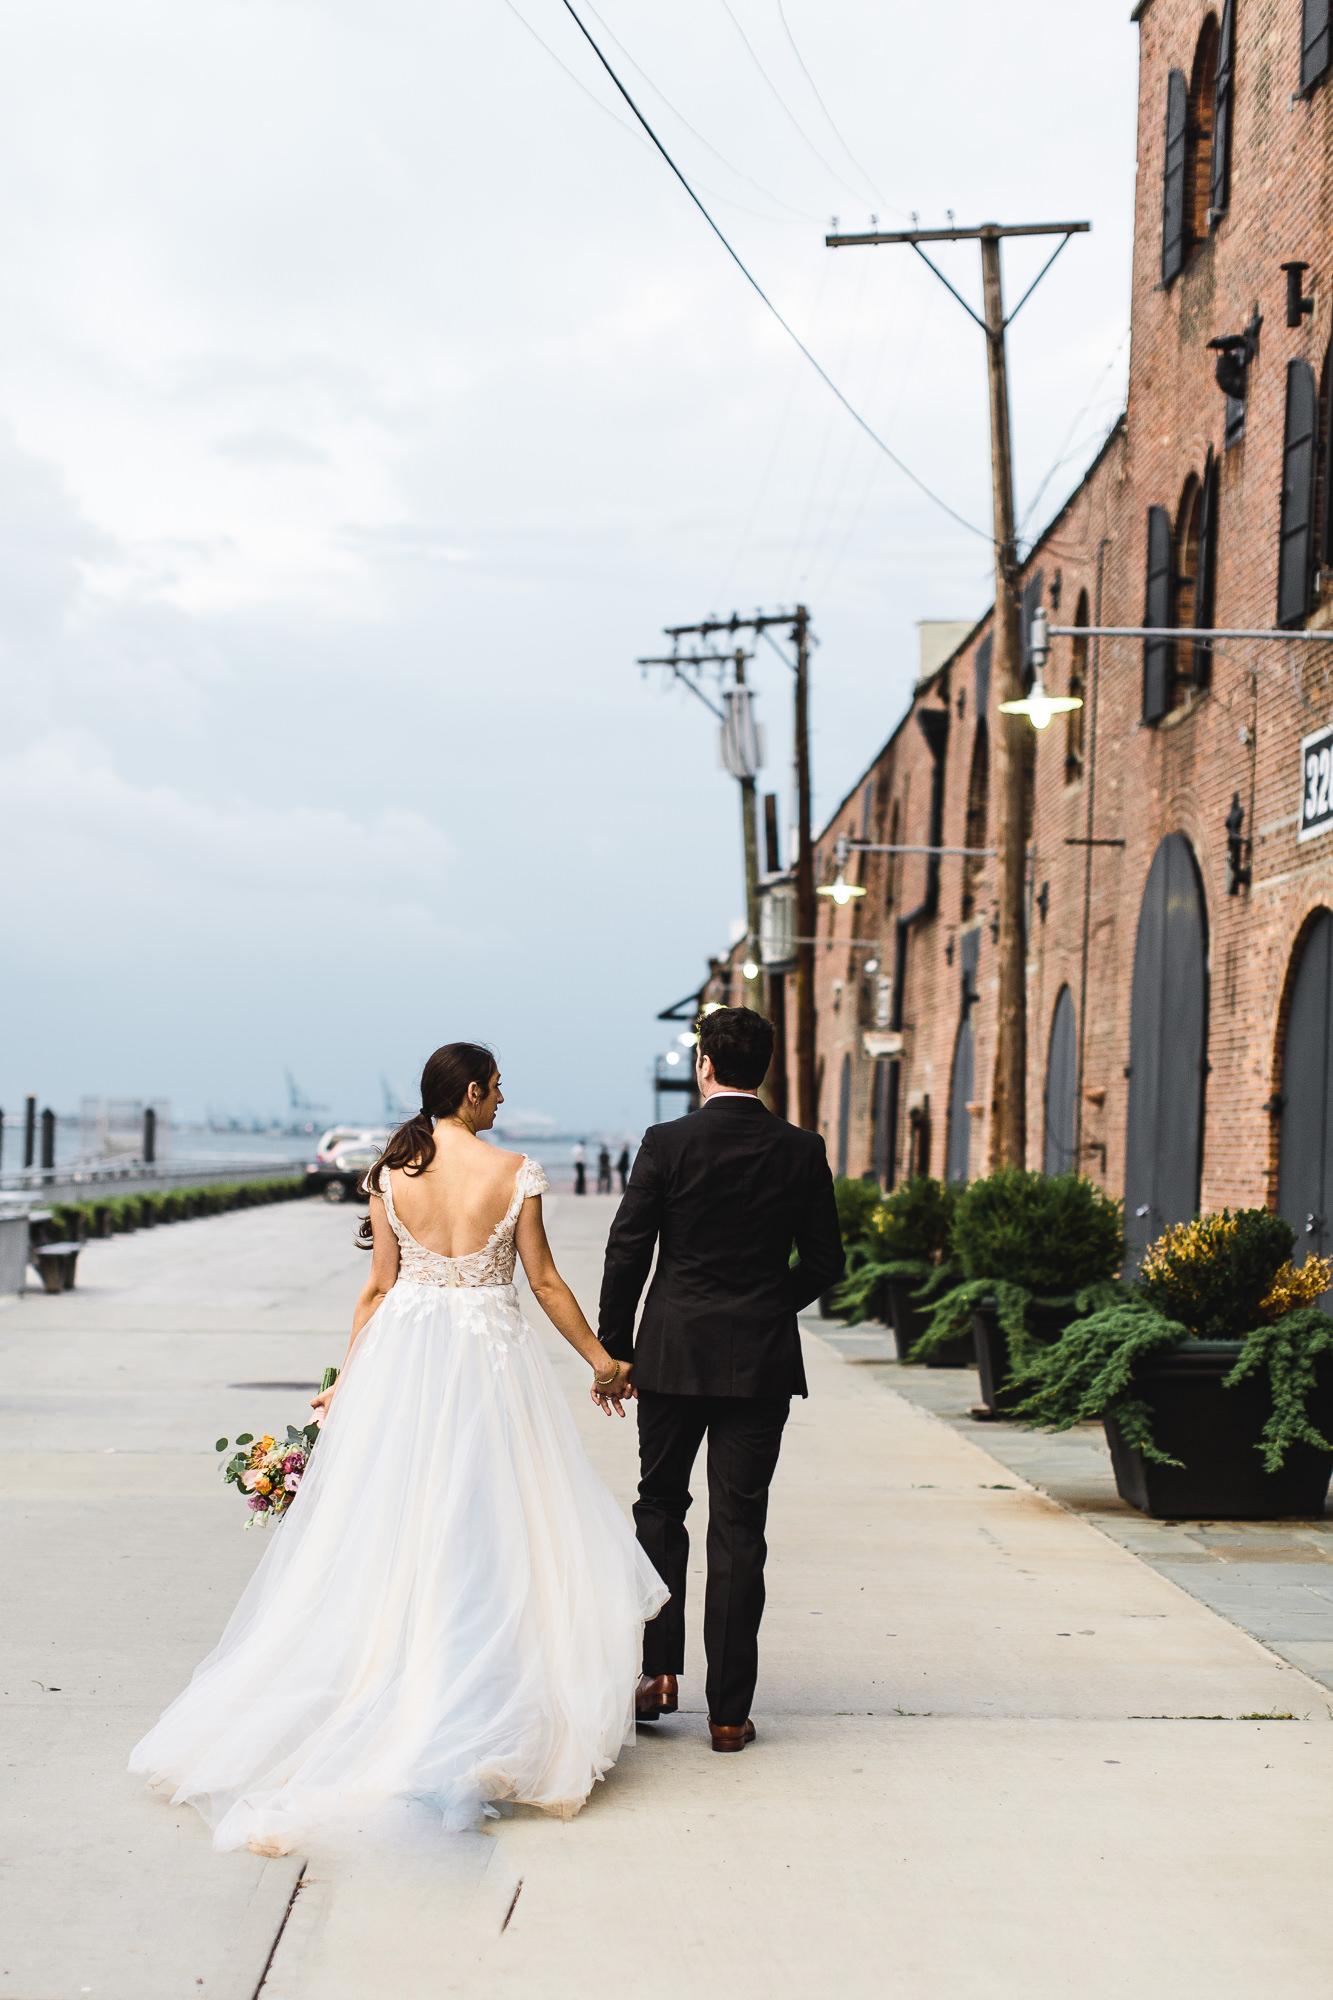 Colorful-Liberty-Warehouse-Brooklyn-Wedding-Emily-Kirke (86 of 100).jpg